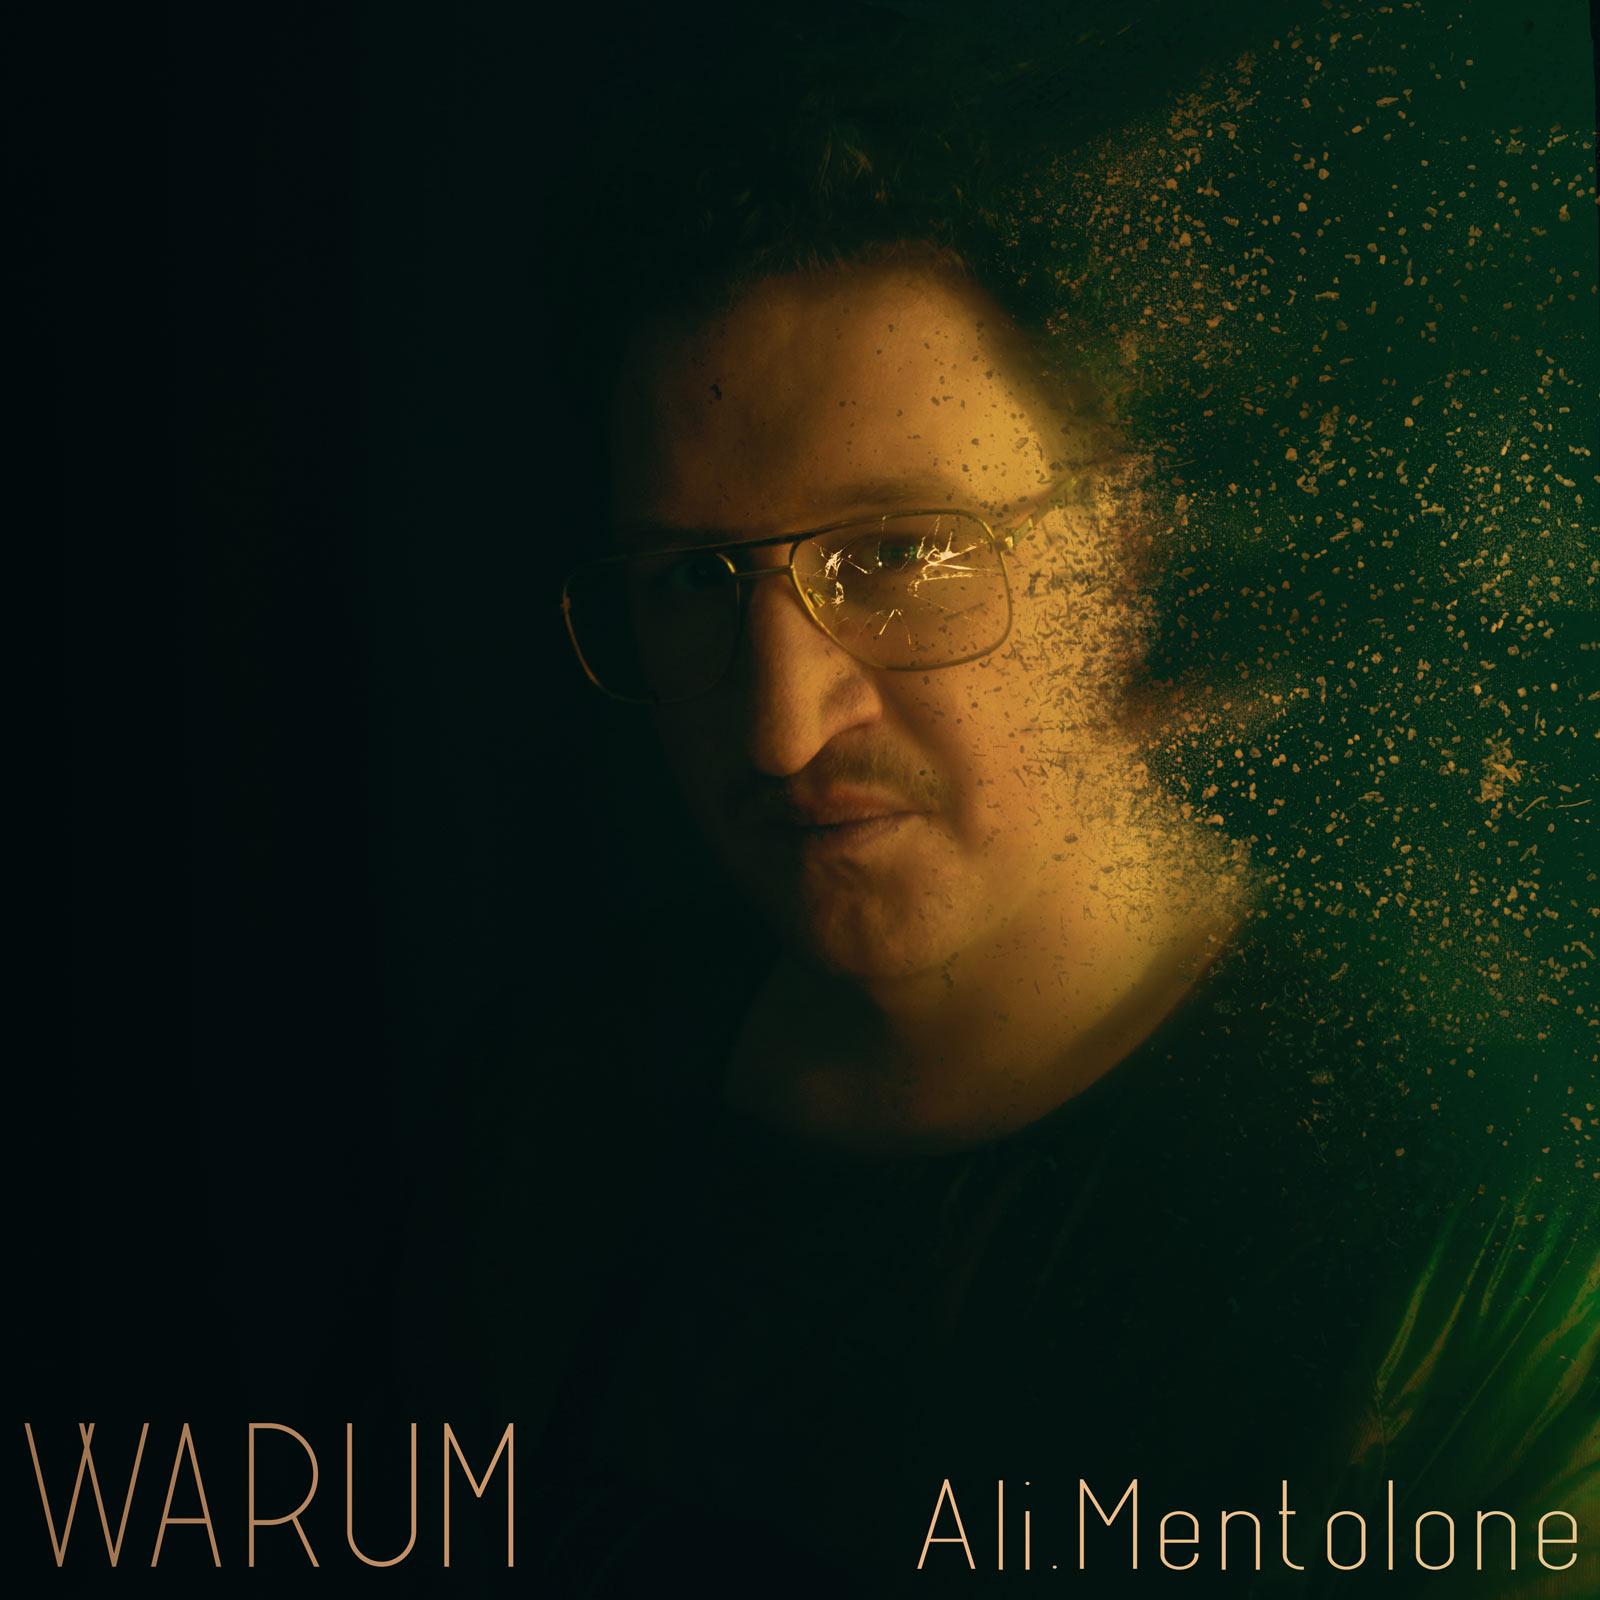 Upcoming: Ali.Mentolone - Warum